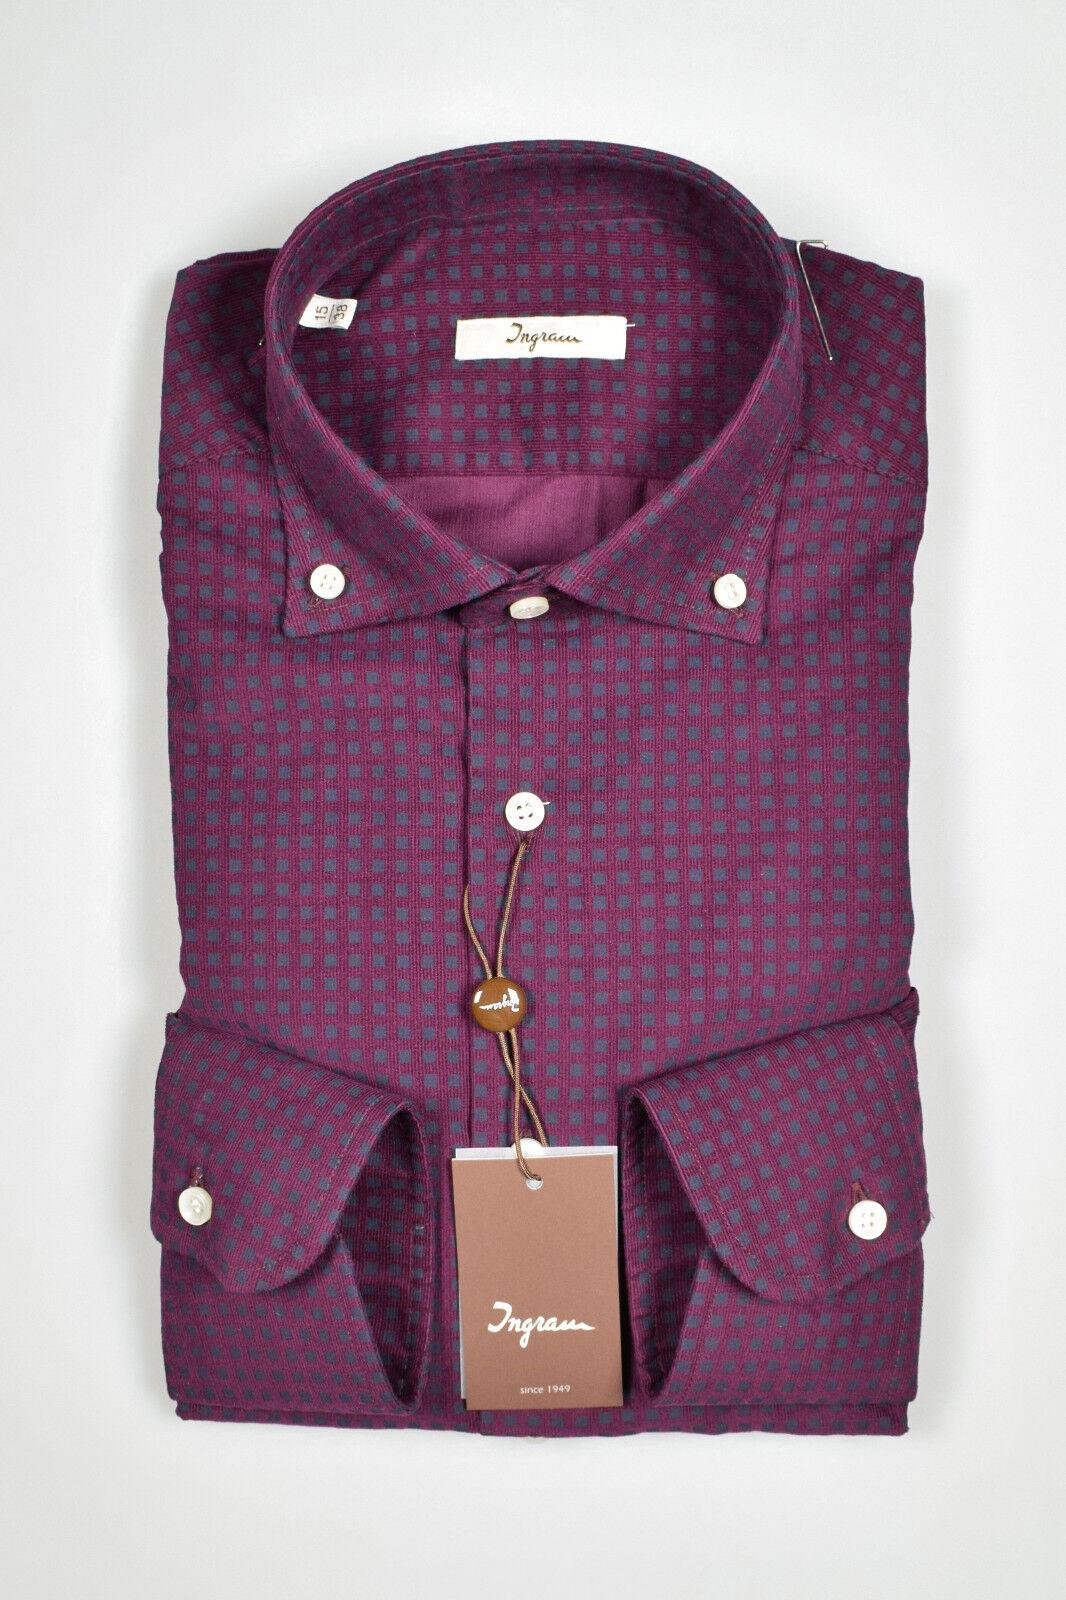 Camicia Bordeaux Down in Velluto stampato Ingram Button Down Bordeaux Regular Fit Inverno18/19 c41078